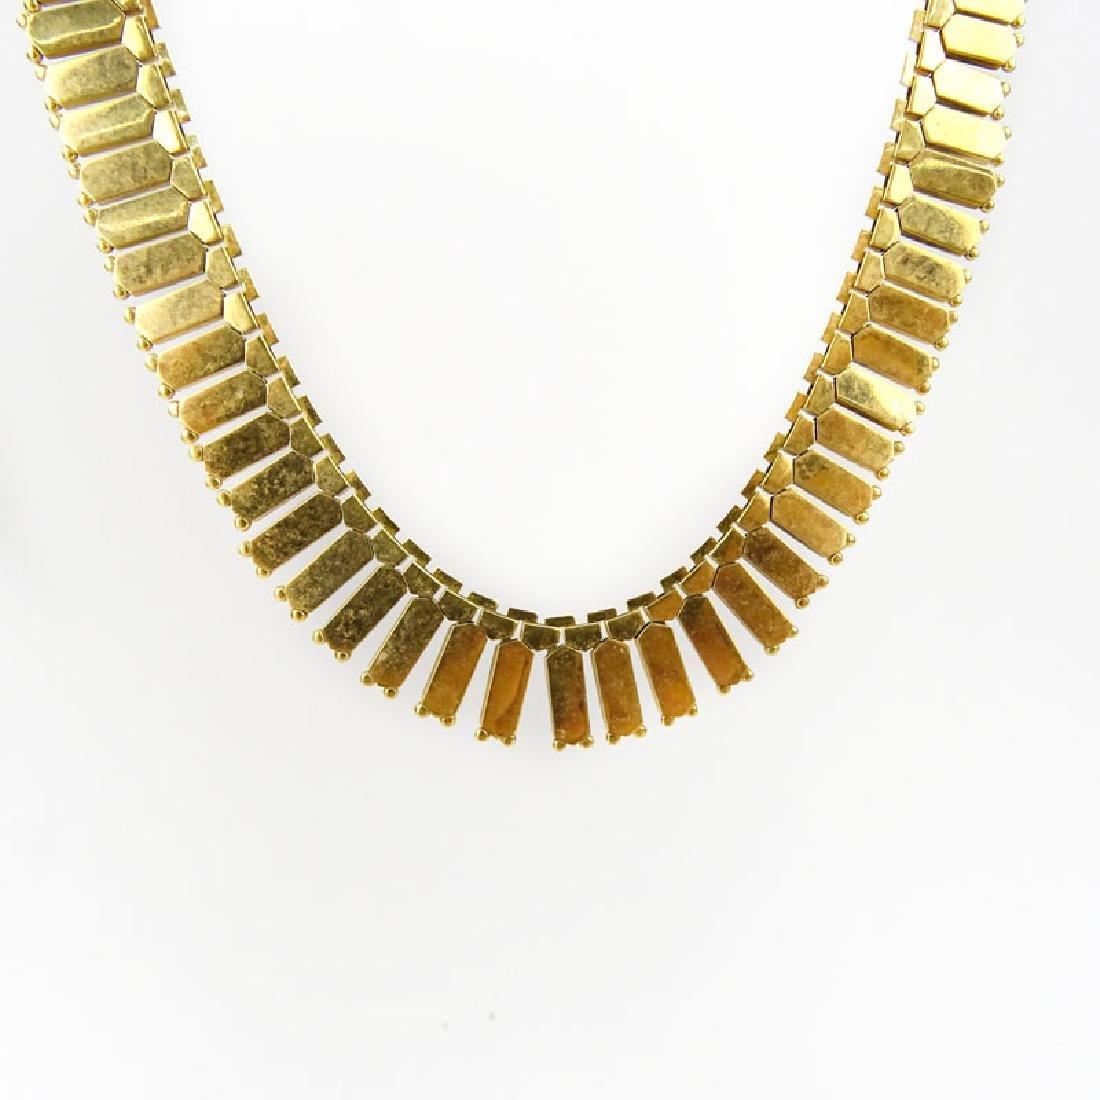 Vintage European 18 Karat Yellow Gold Necklace. Stamped